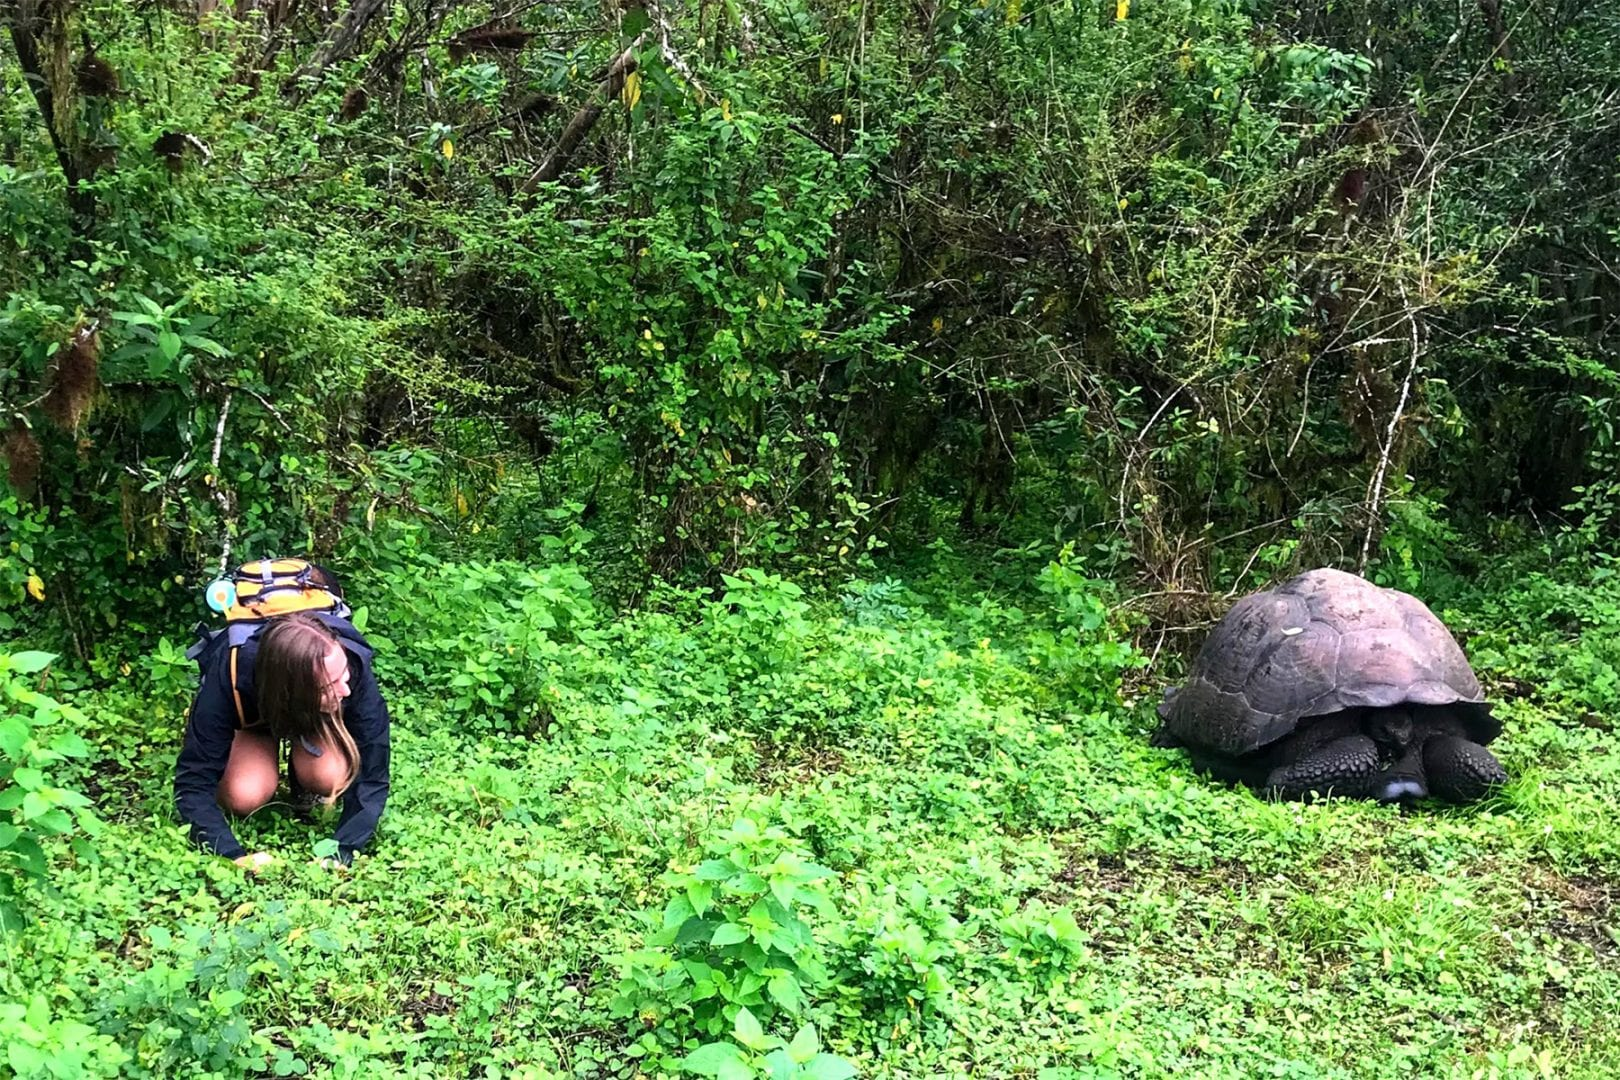 Student crouching near Galapagos tortoise